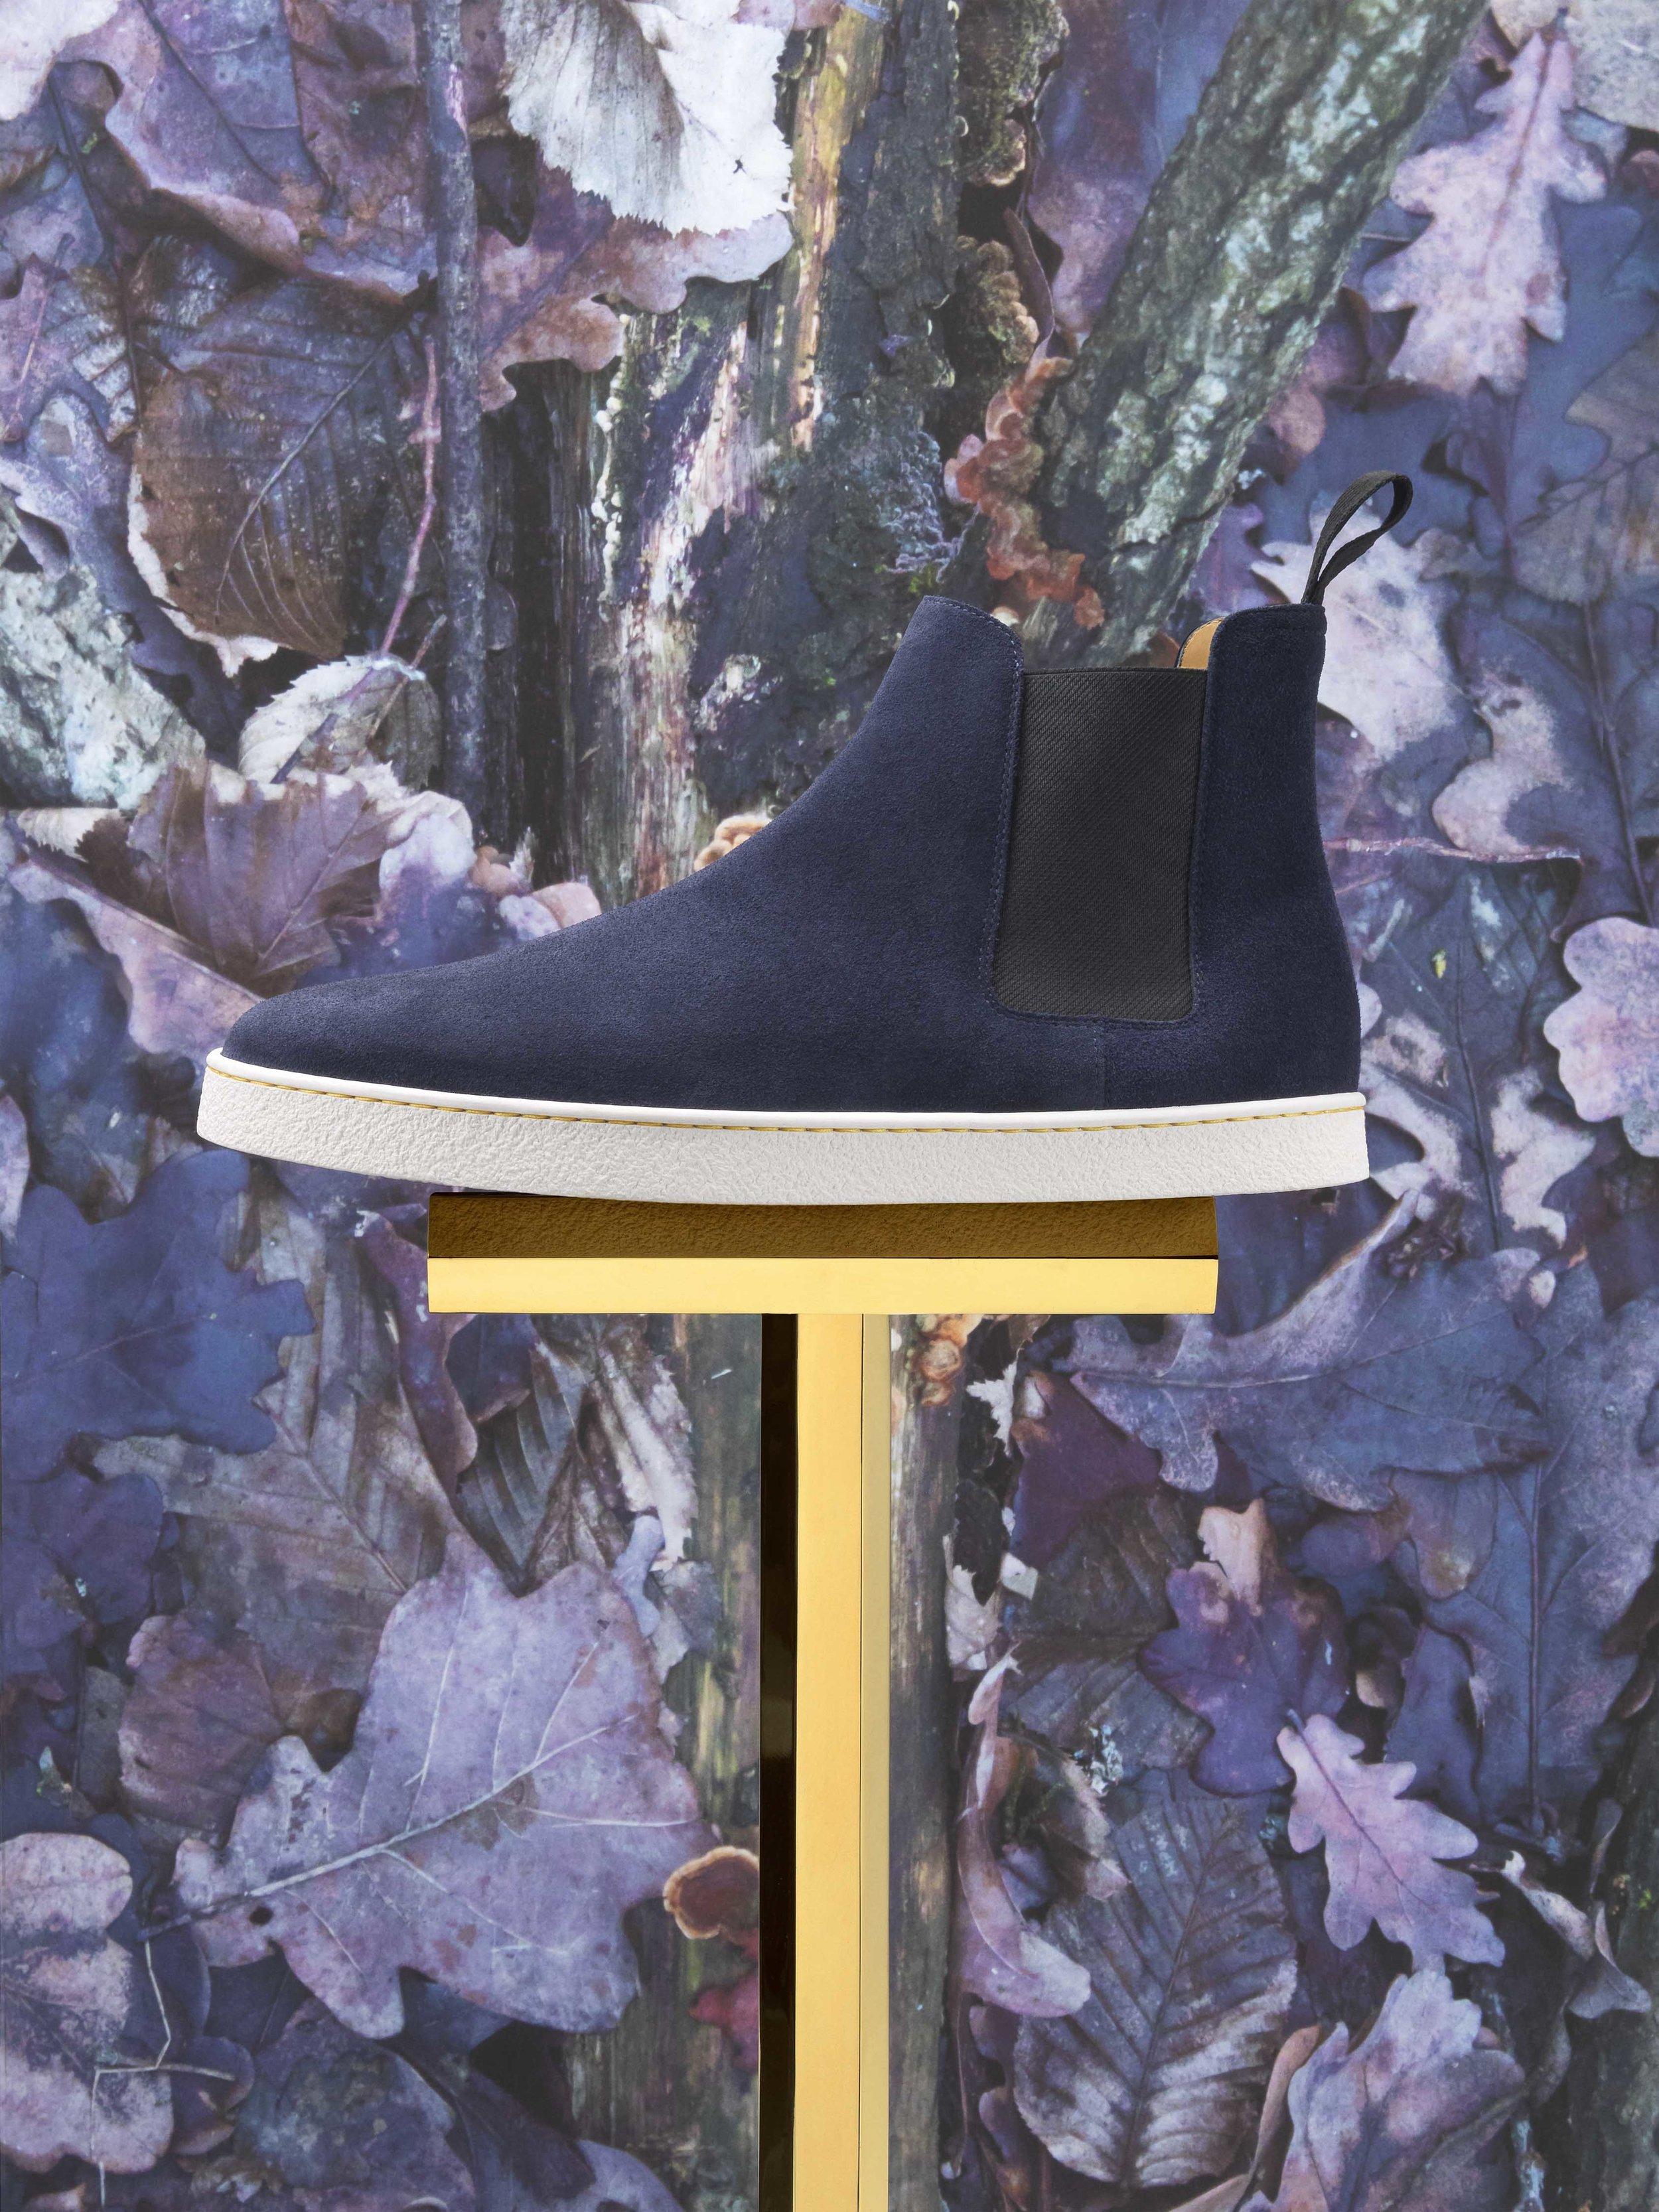 John Lobb / Luxury Shoe Manufacturer / Product Retouching